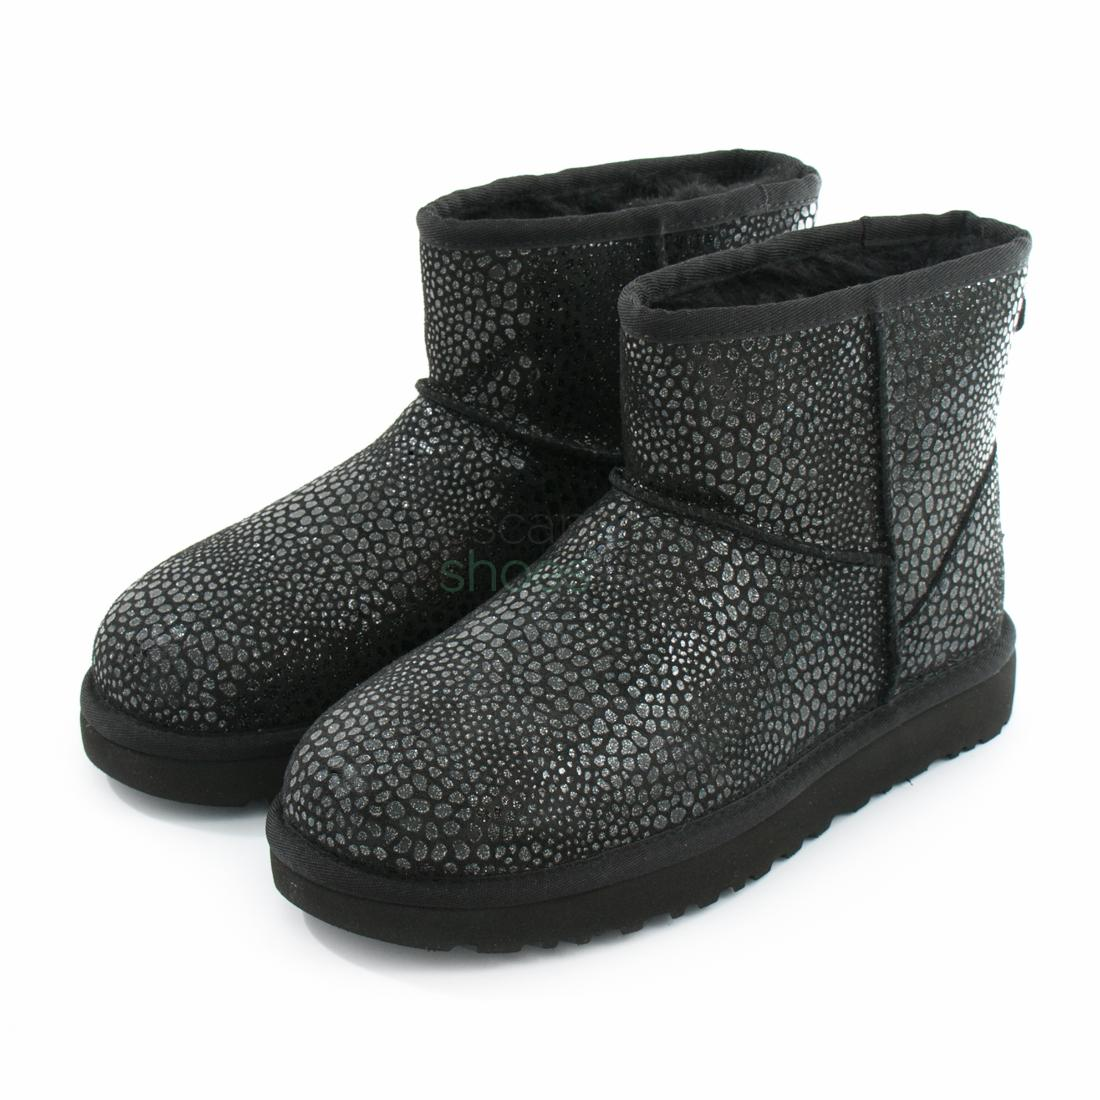 93d0c681ca4 Boots UGG Australia Classic Mini Glitzy Black 1019637